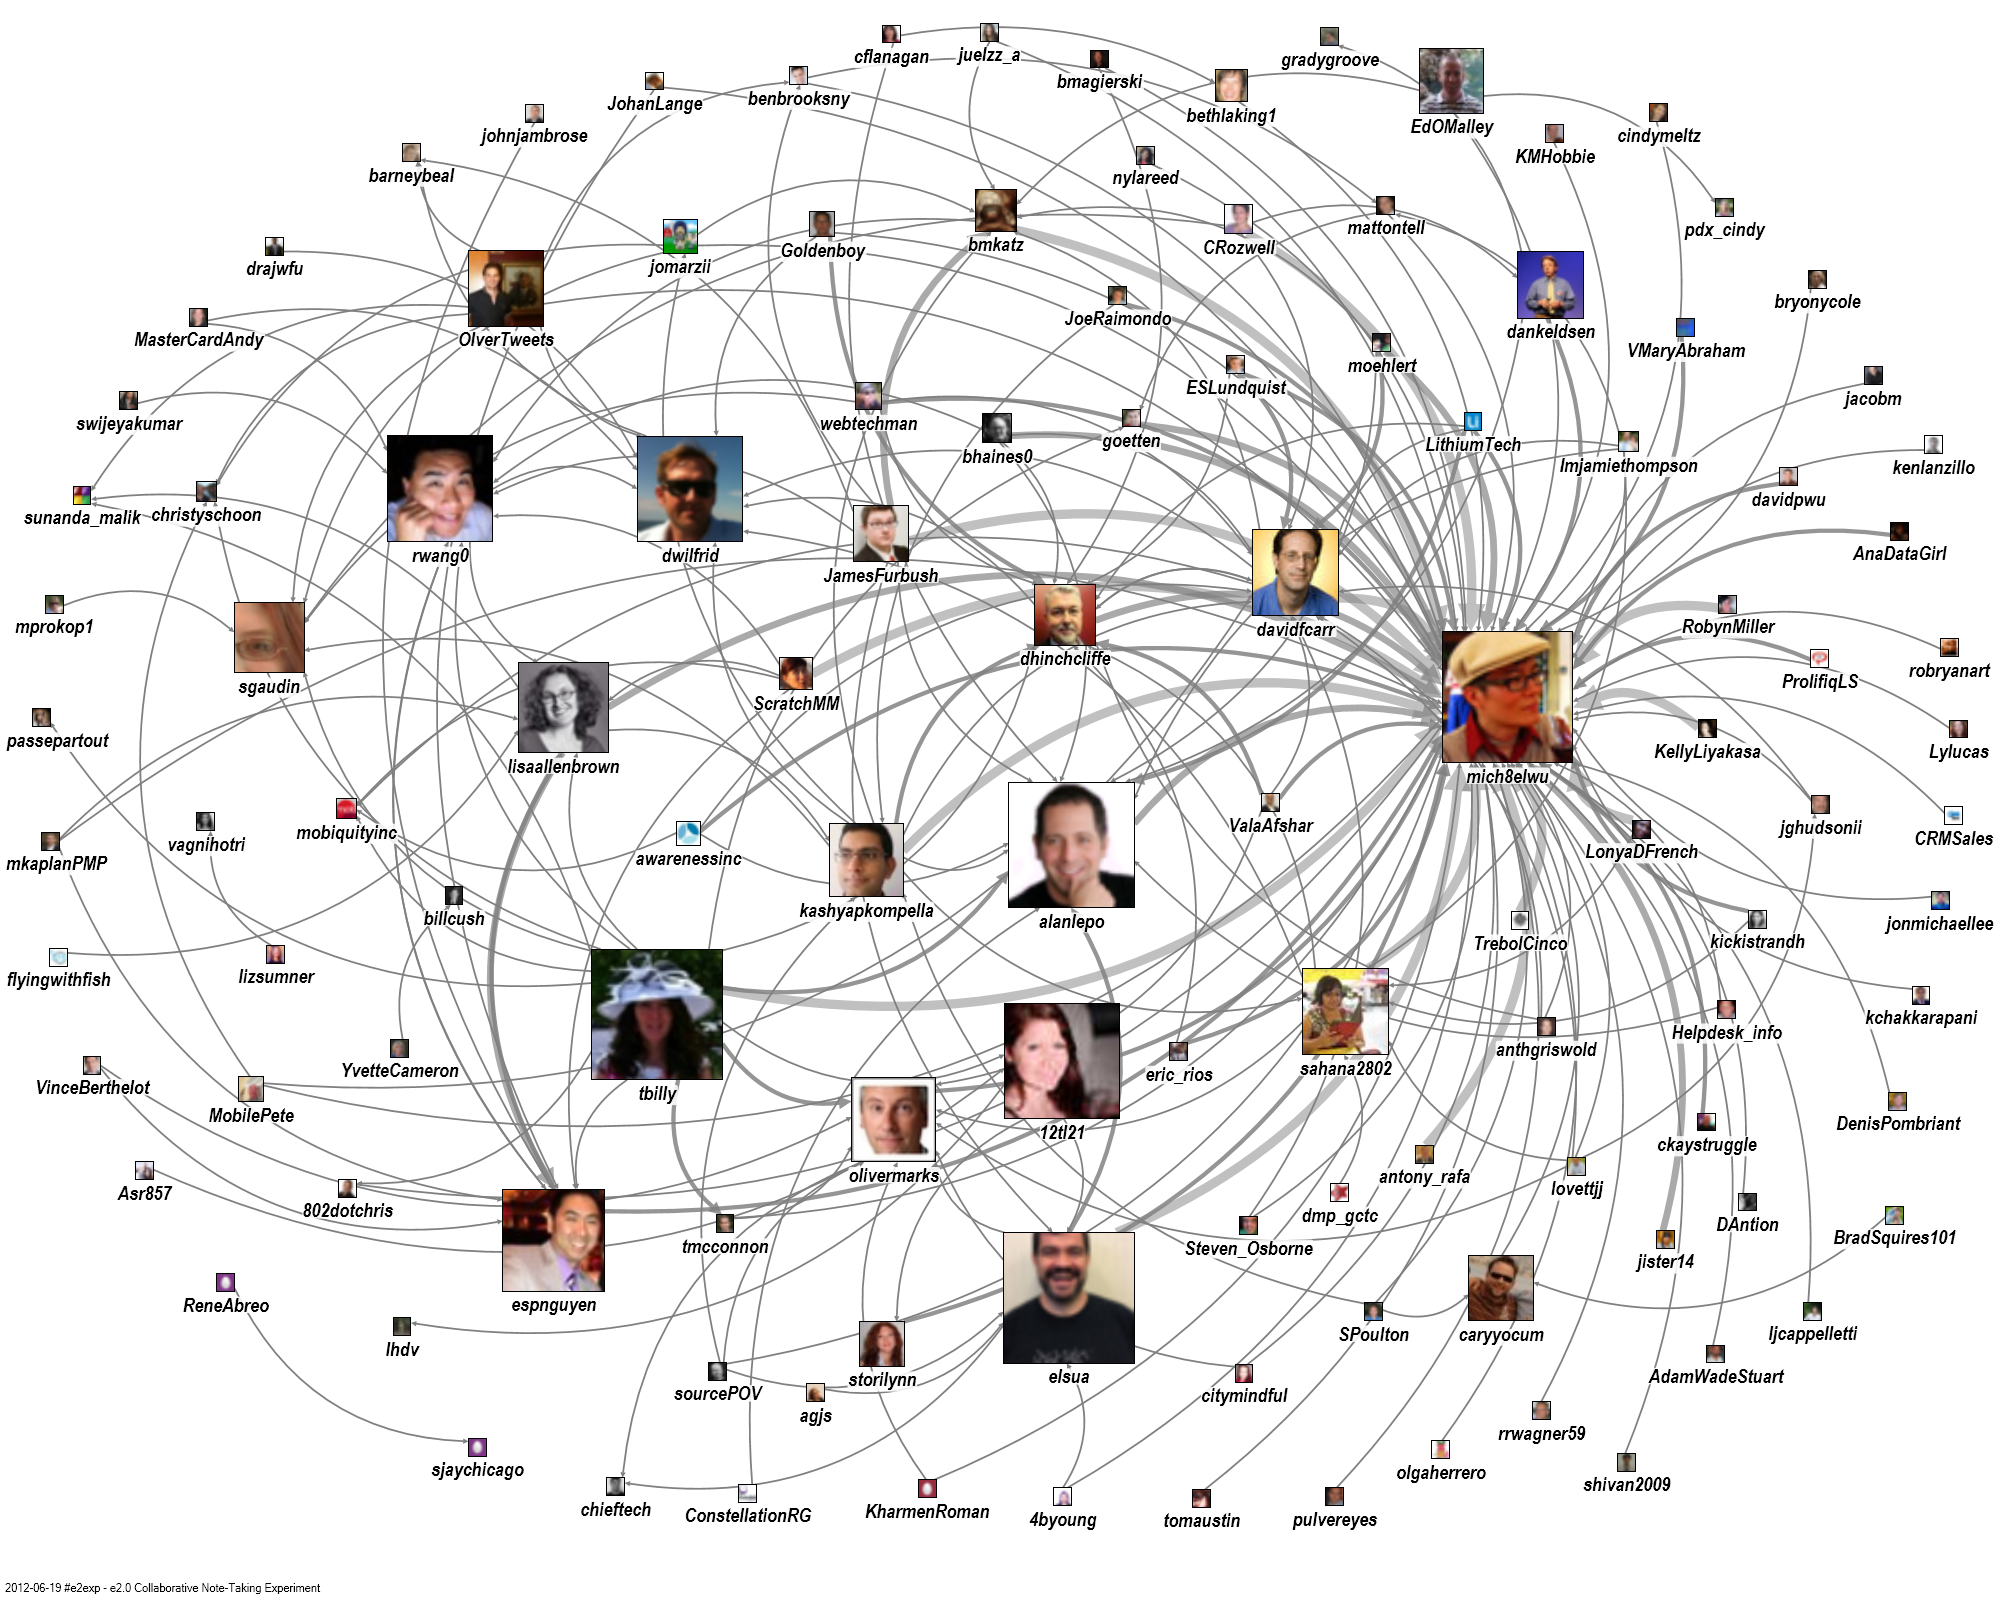 e2conf e2exp CollaborationGraph Btwn.png